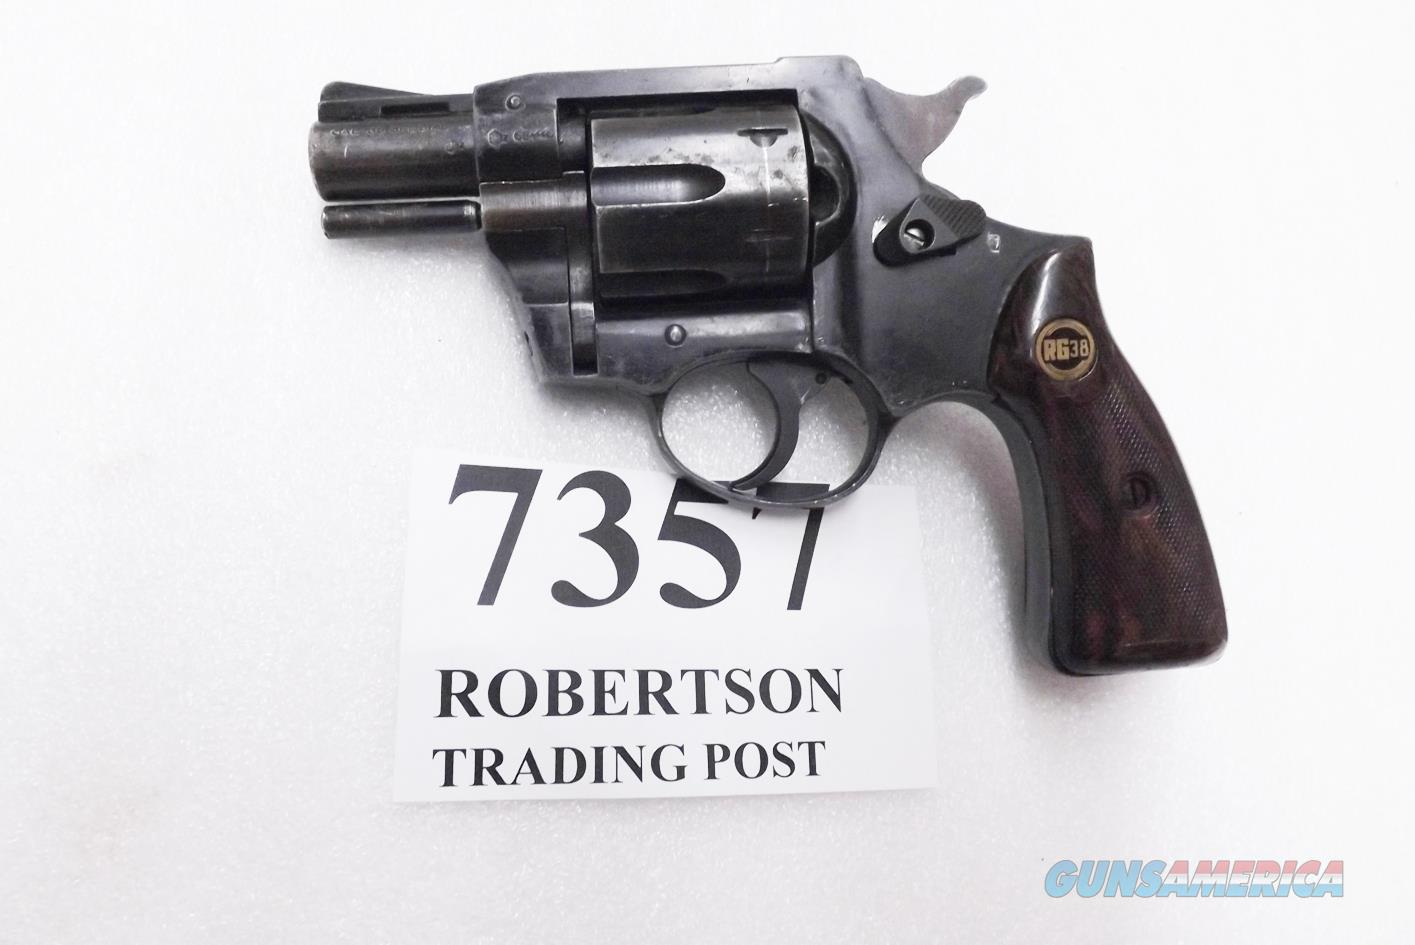 Rohm .38 Special RG38 Gunsmith Special Repairs Needed Revolver Snub 2 inch Vent Rib Pinned Barrel 1967 Production C&R OK  Guns > Pistols > FIE Pistols